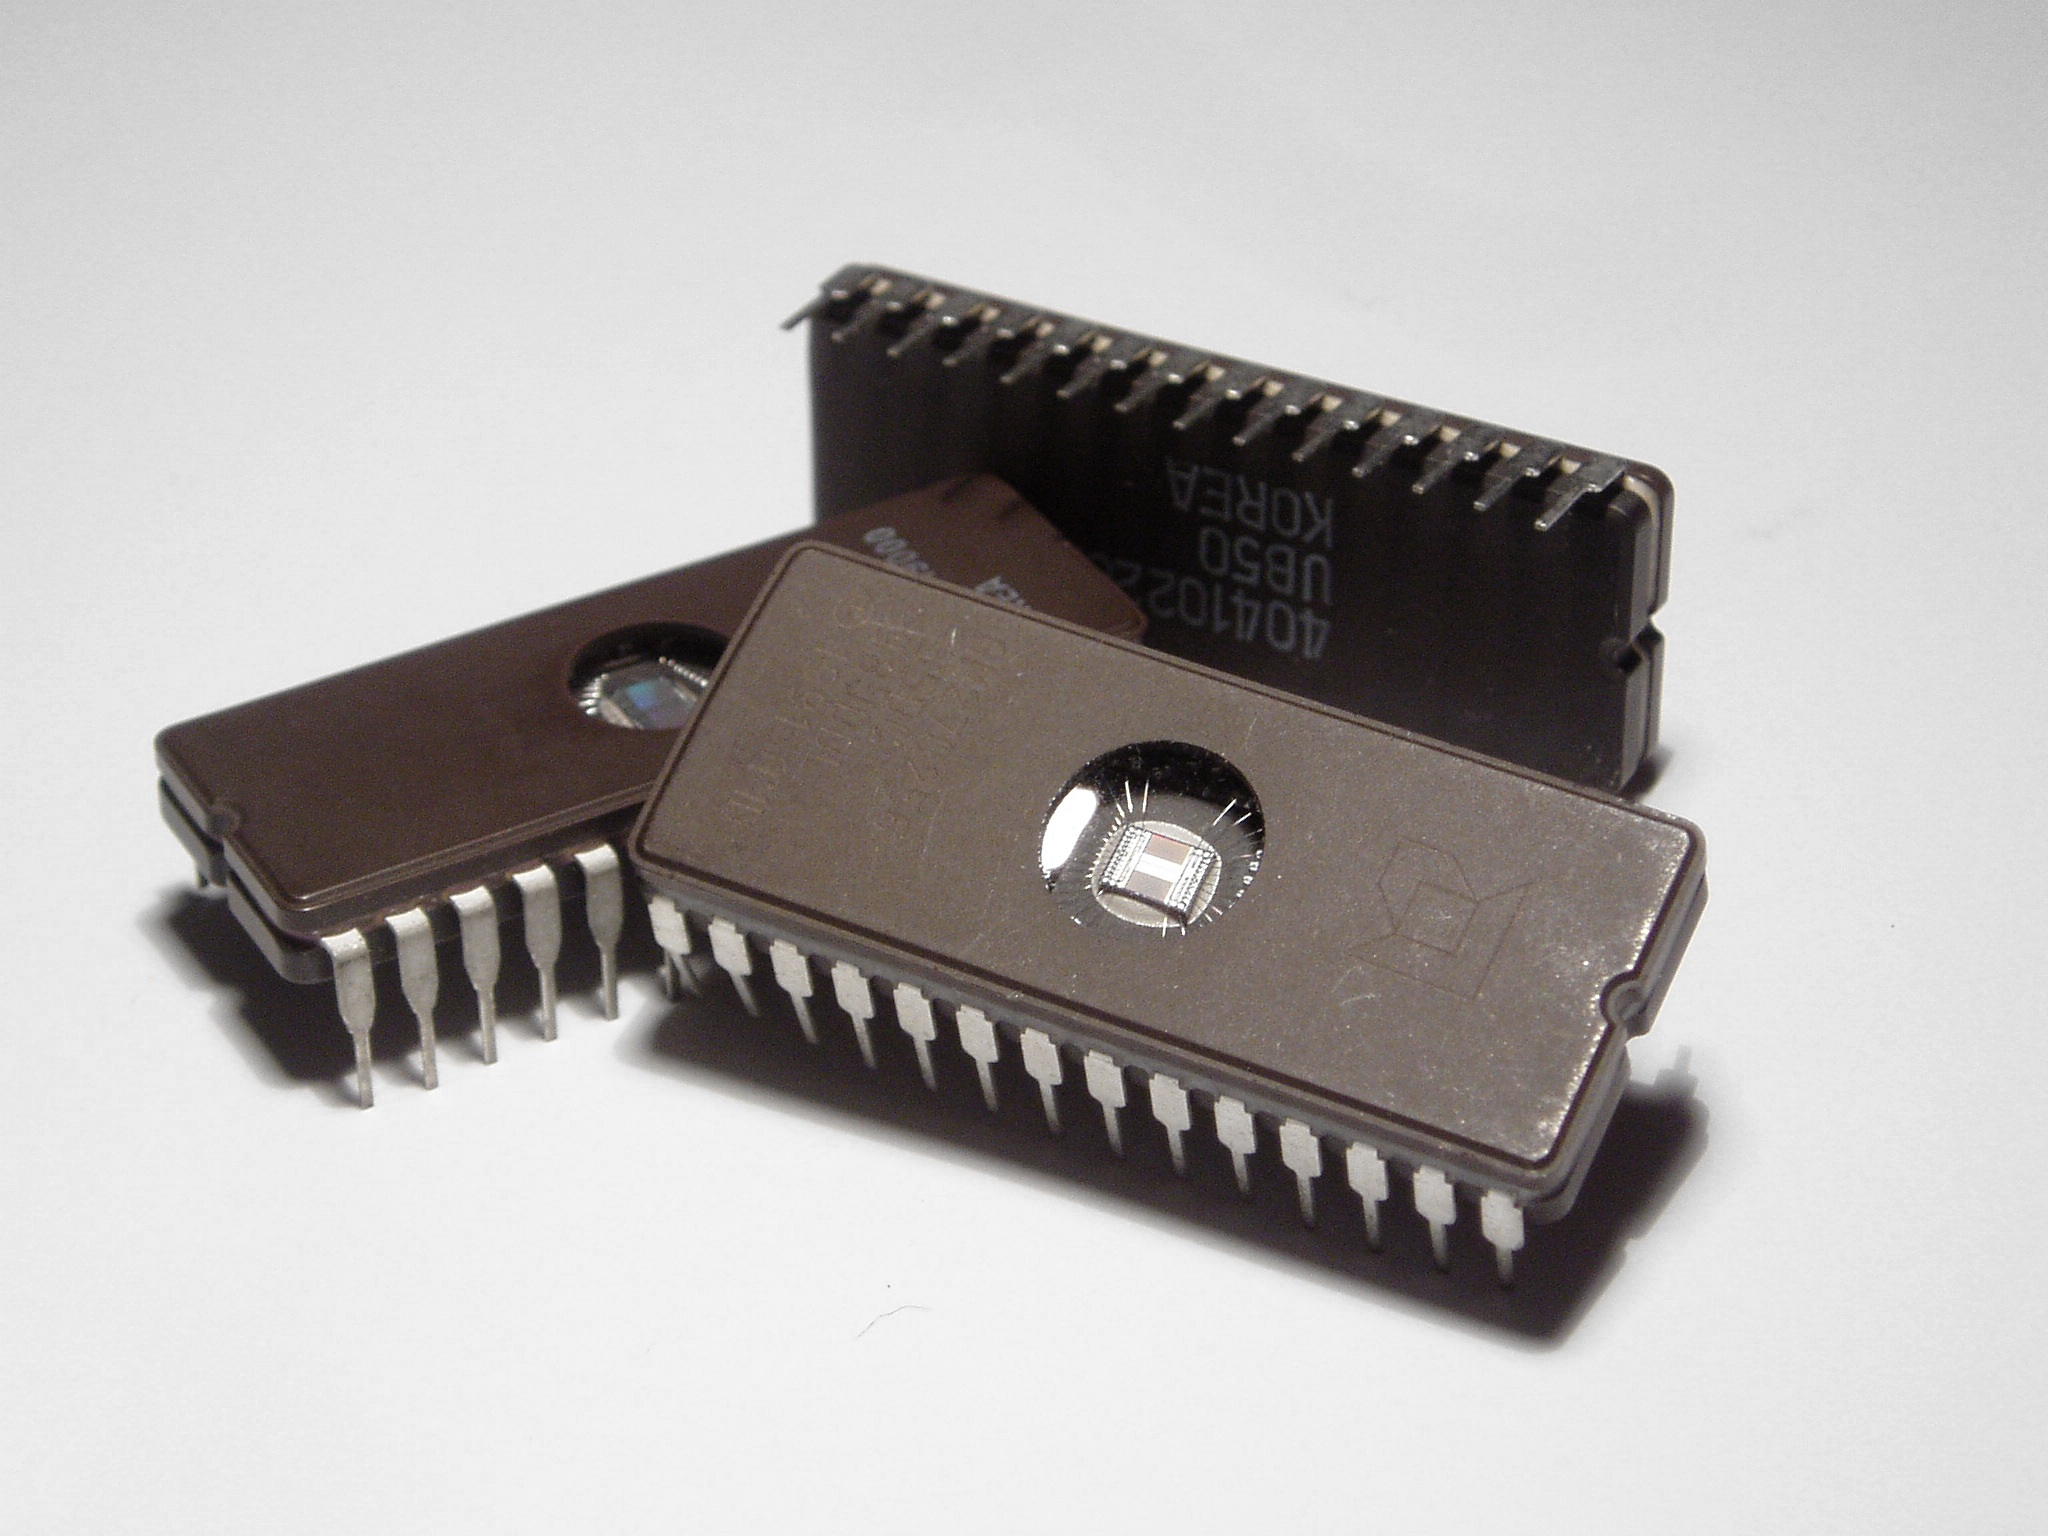 Tremendous Integrated Circuit Wikipedia Wiring Cloud Loplapiotaidewilluminateatxorg